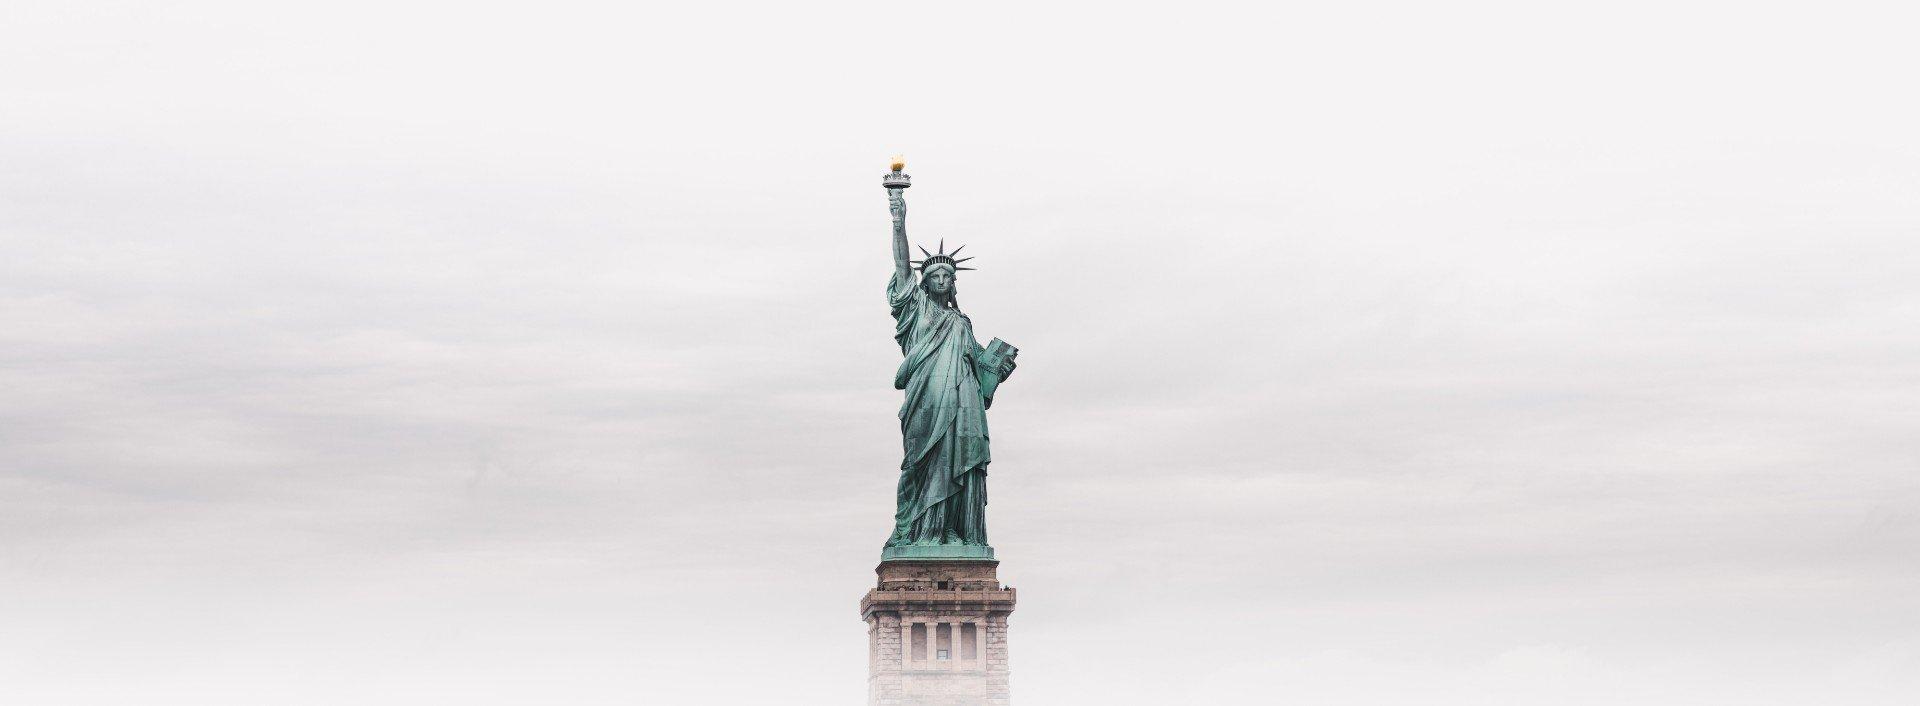 Statue of Liberty in the fog- 6 Distinct American Phrases